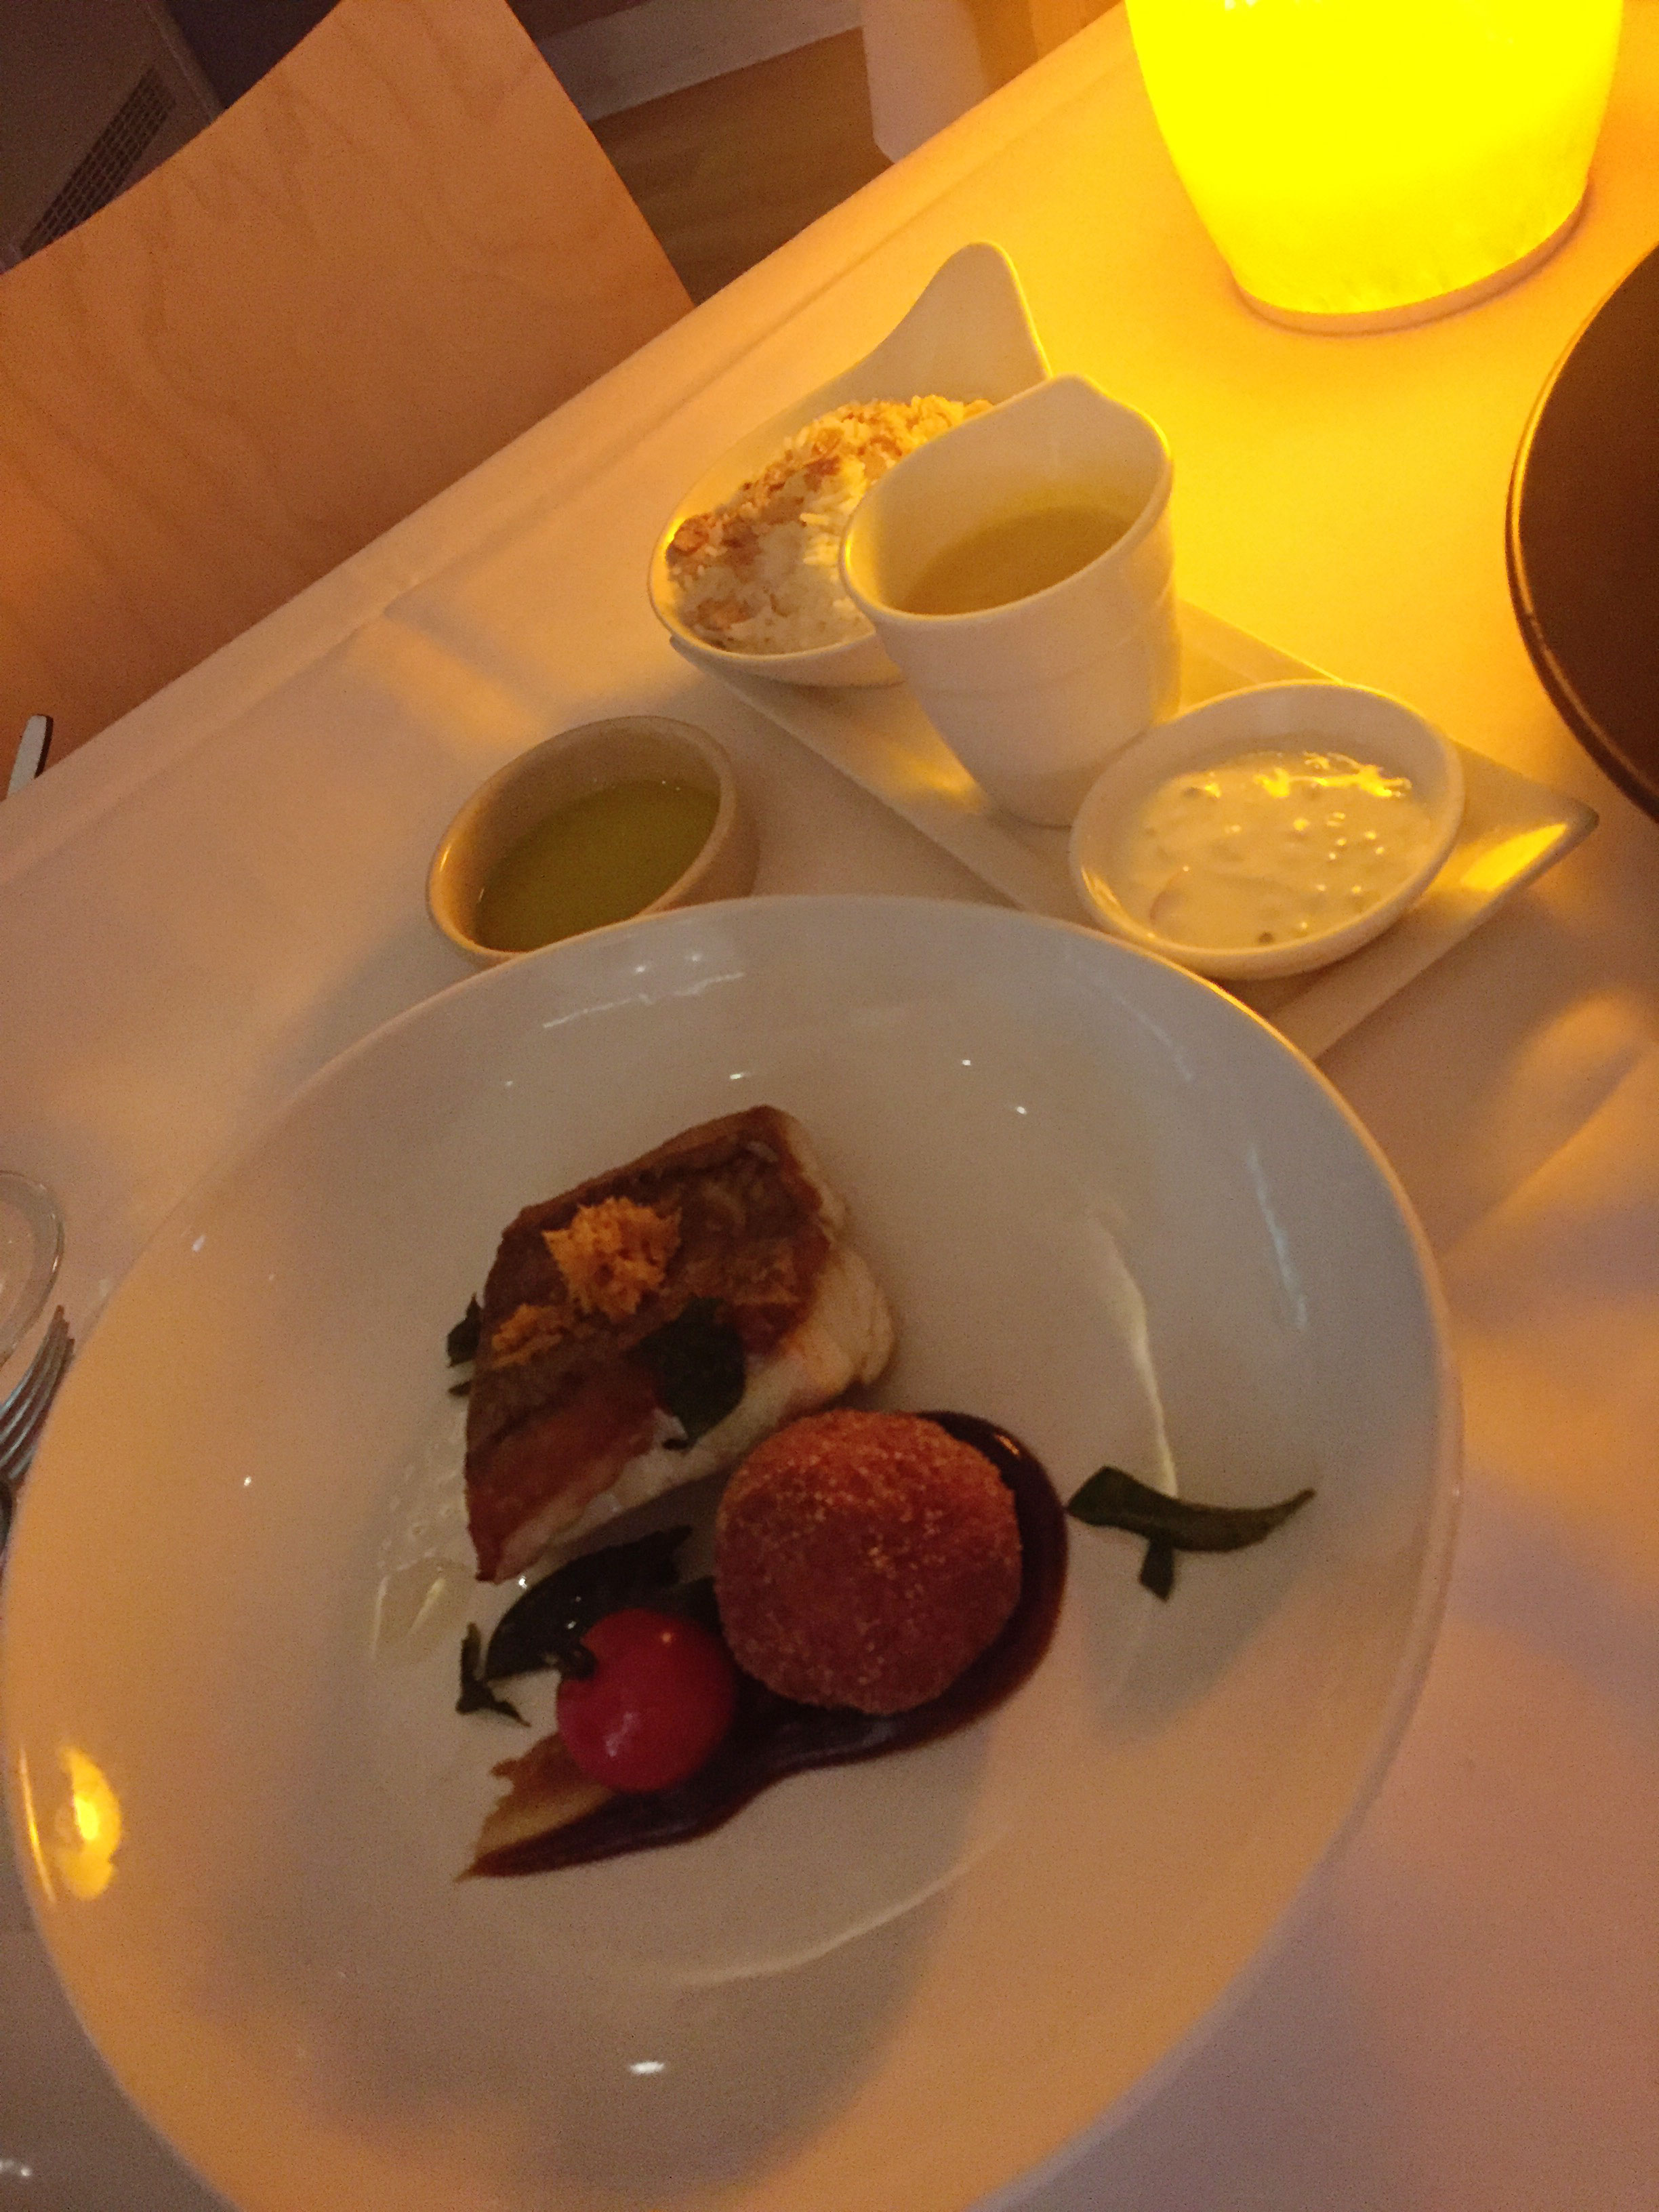 Noosa Beach House Peter Kuruvita Restaurant : Sri Lankan Snapper Curry with tamarind, aloo chop, steamed rice